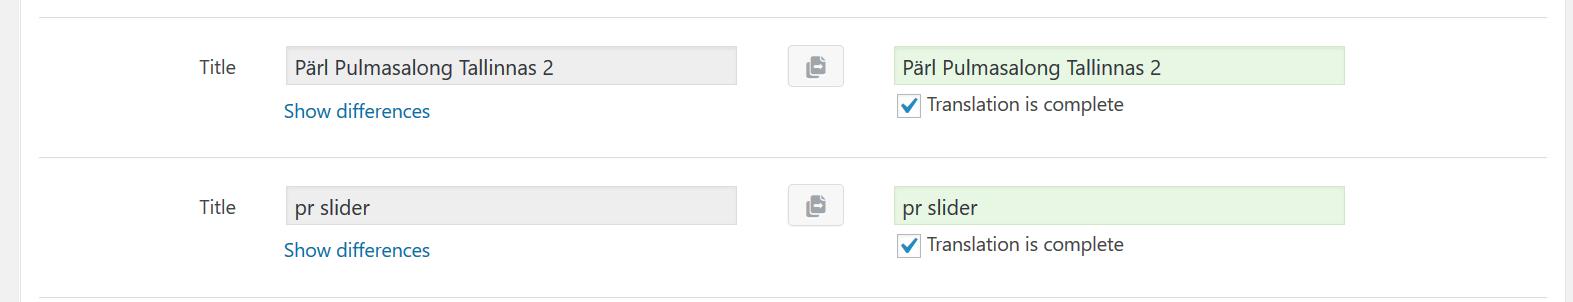 Screenshot_2019-06-18 Translations ‹ Pärl Pulmasalong — WordPress.png